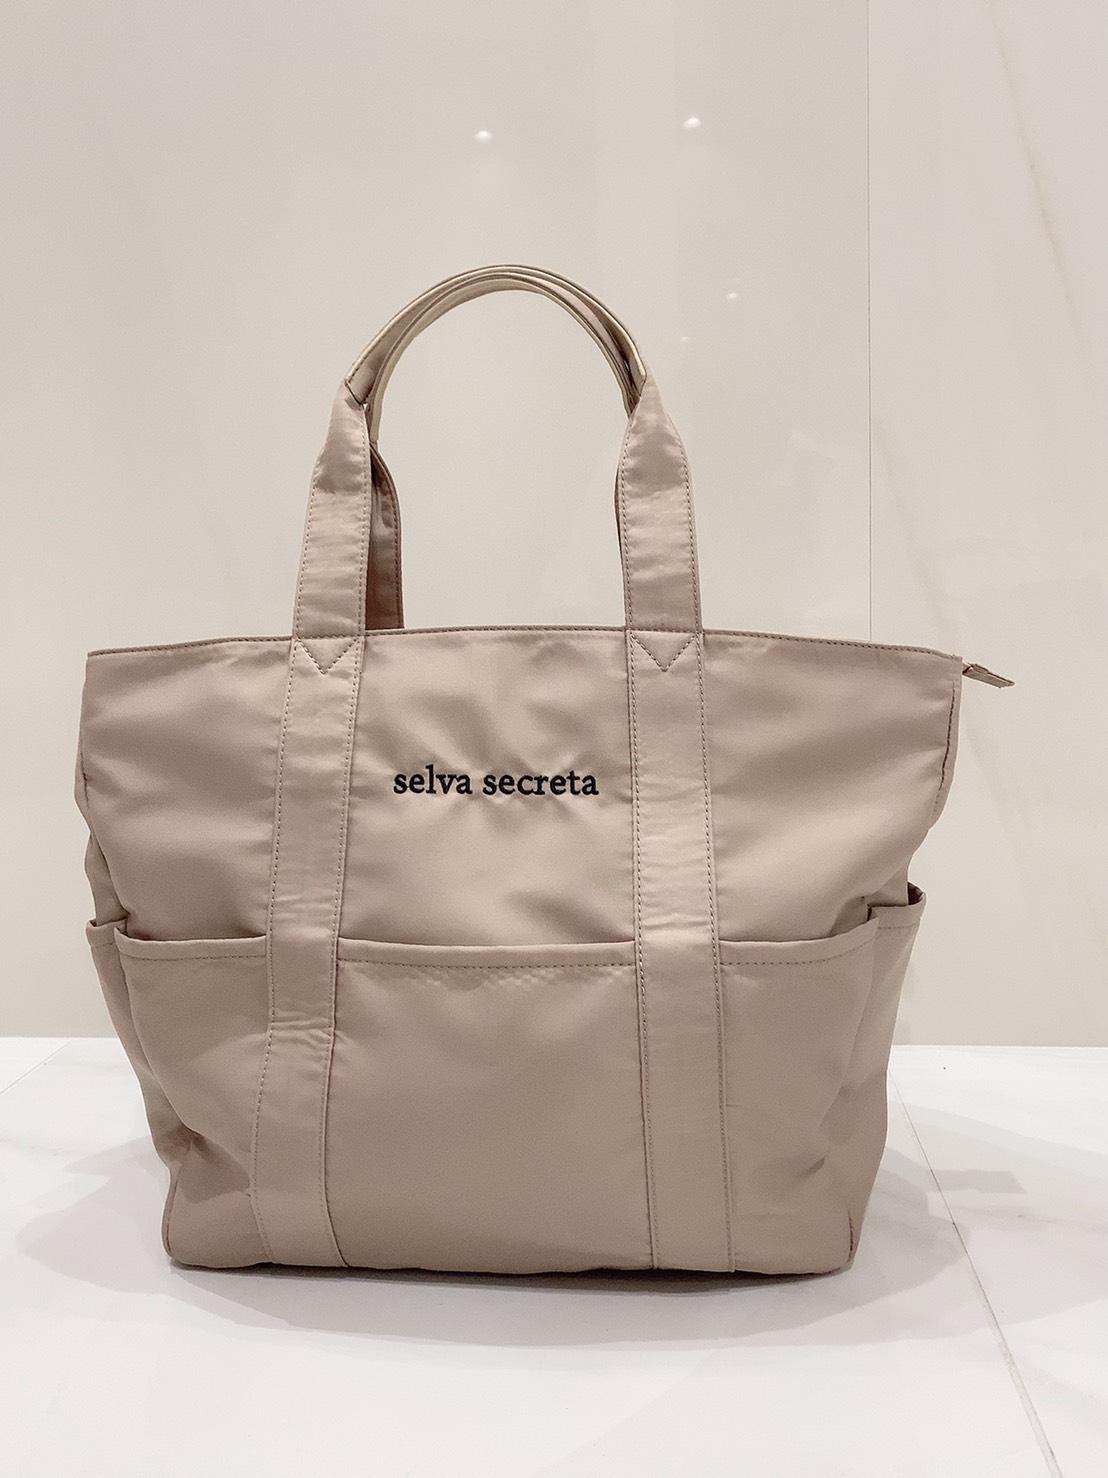 【selva secreta】useful TOTE BAG(light-beige)